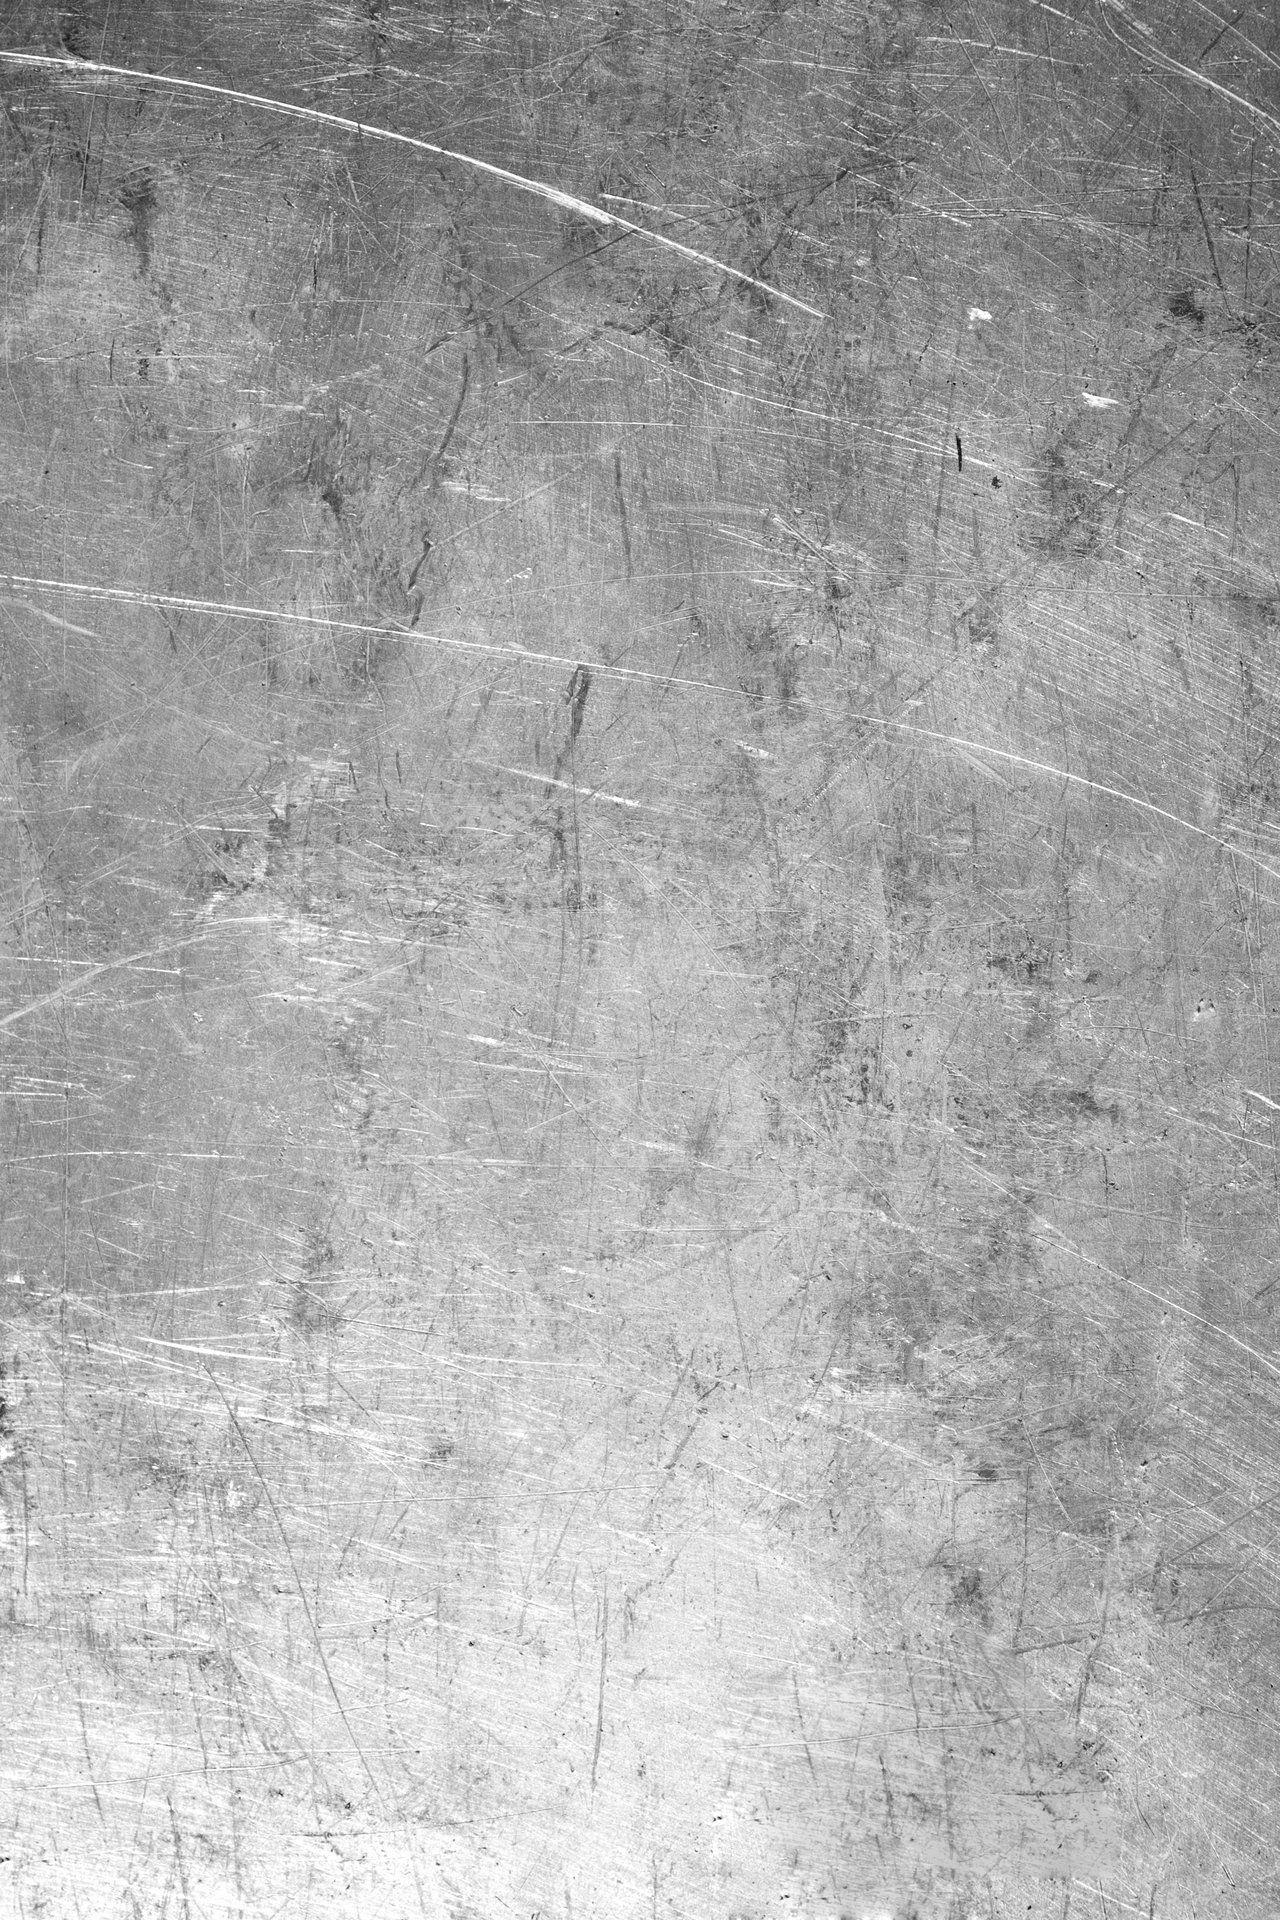 shiny metallic texture by =night.